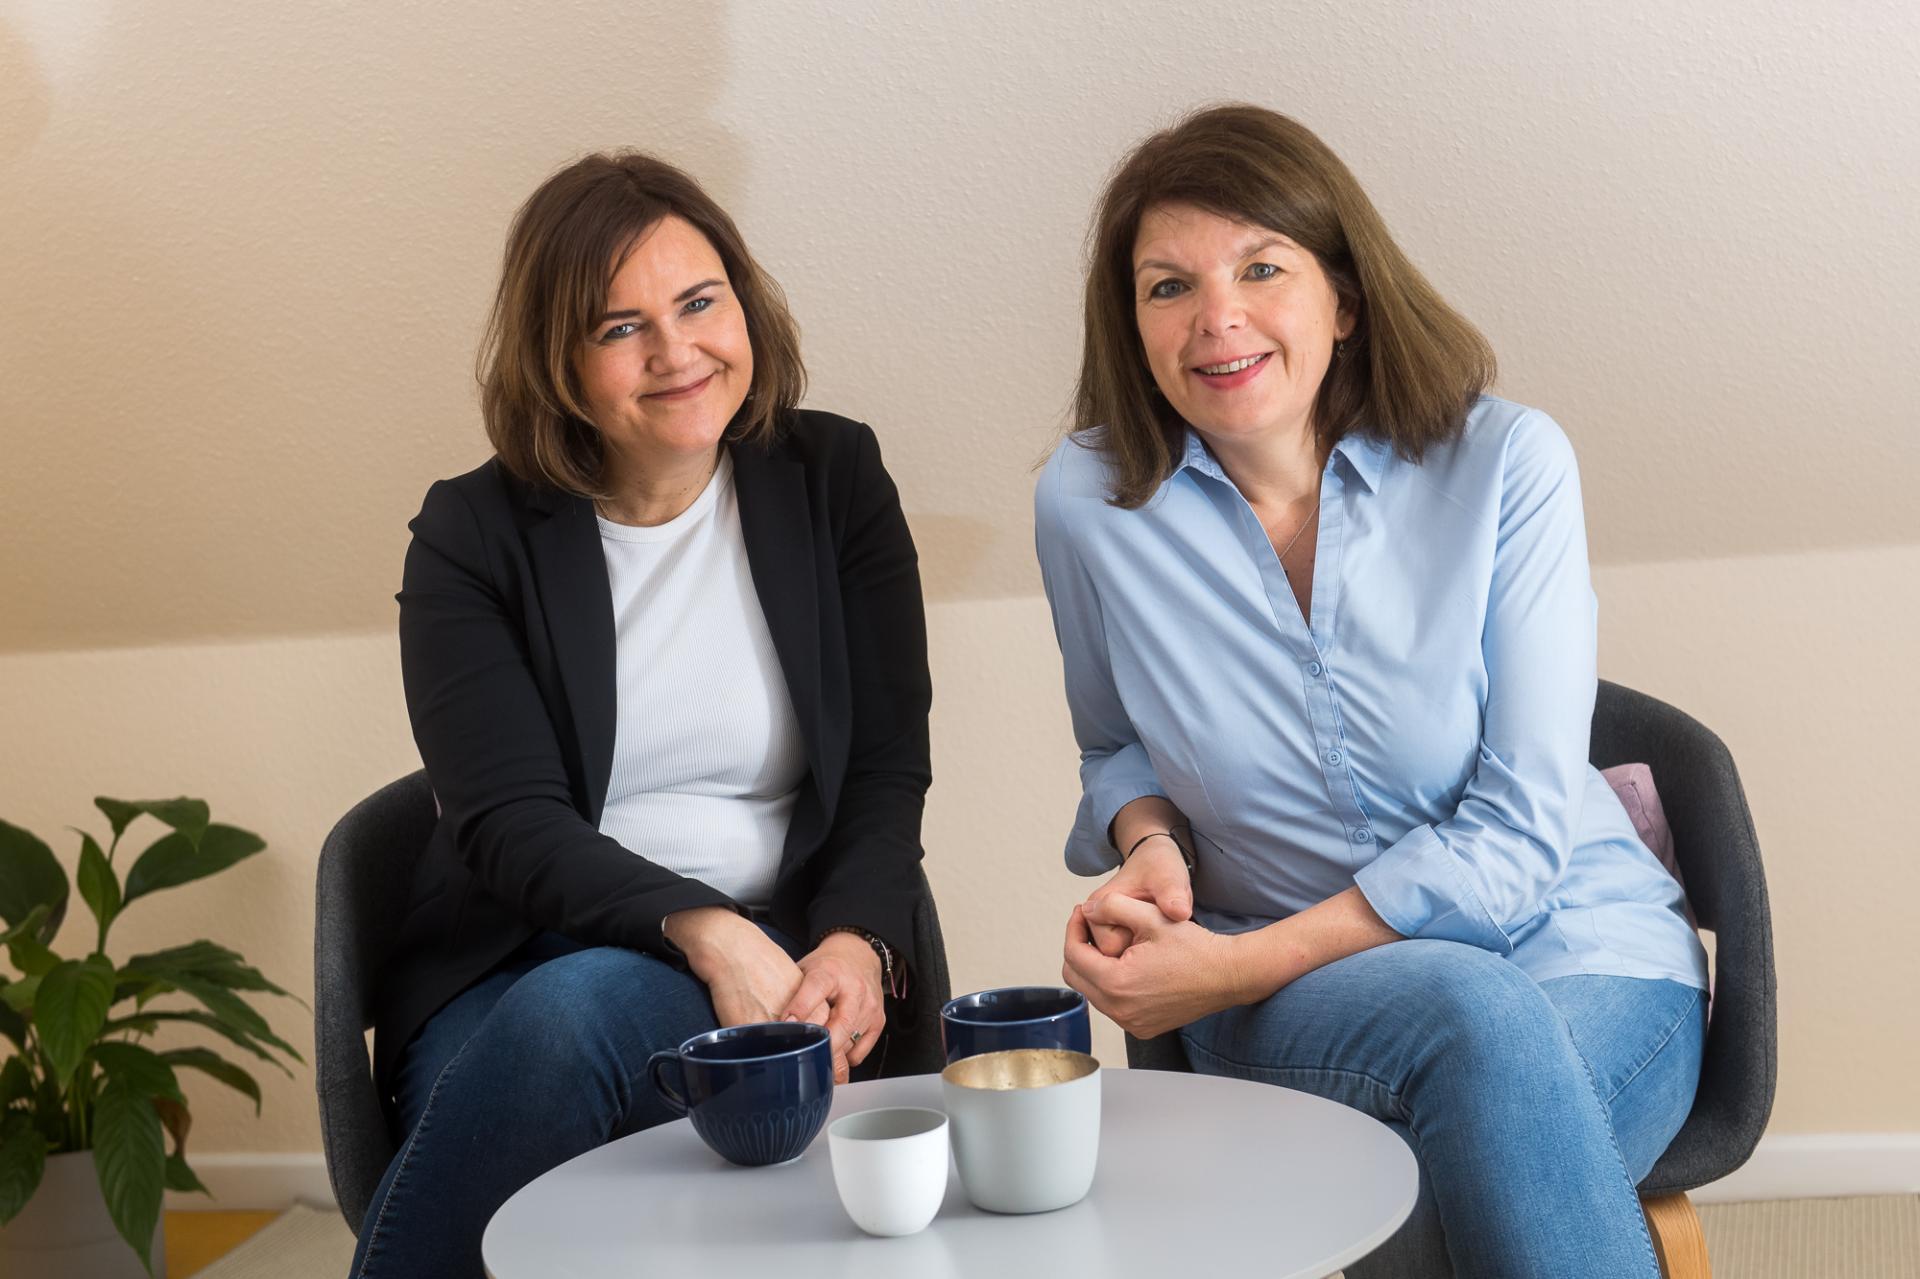 Monika Petersen, Kirsten Biegemann